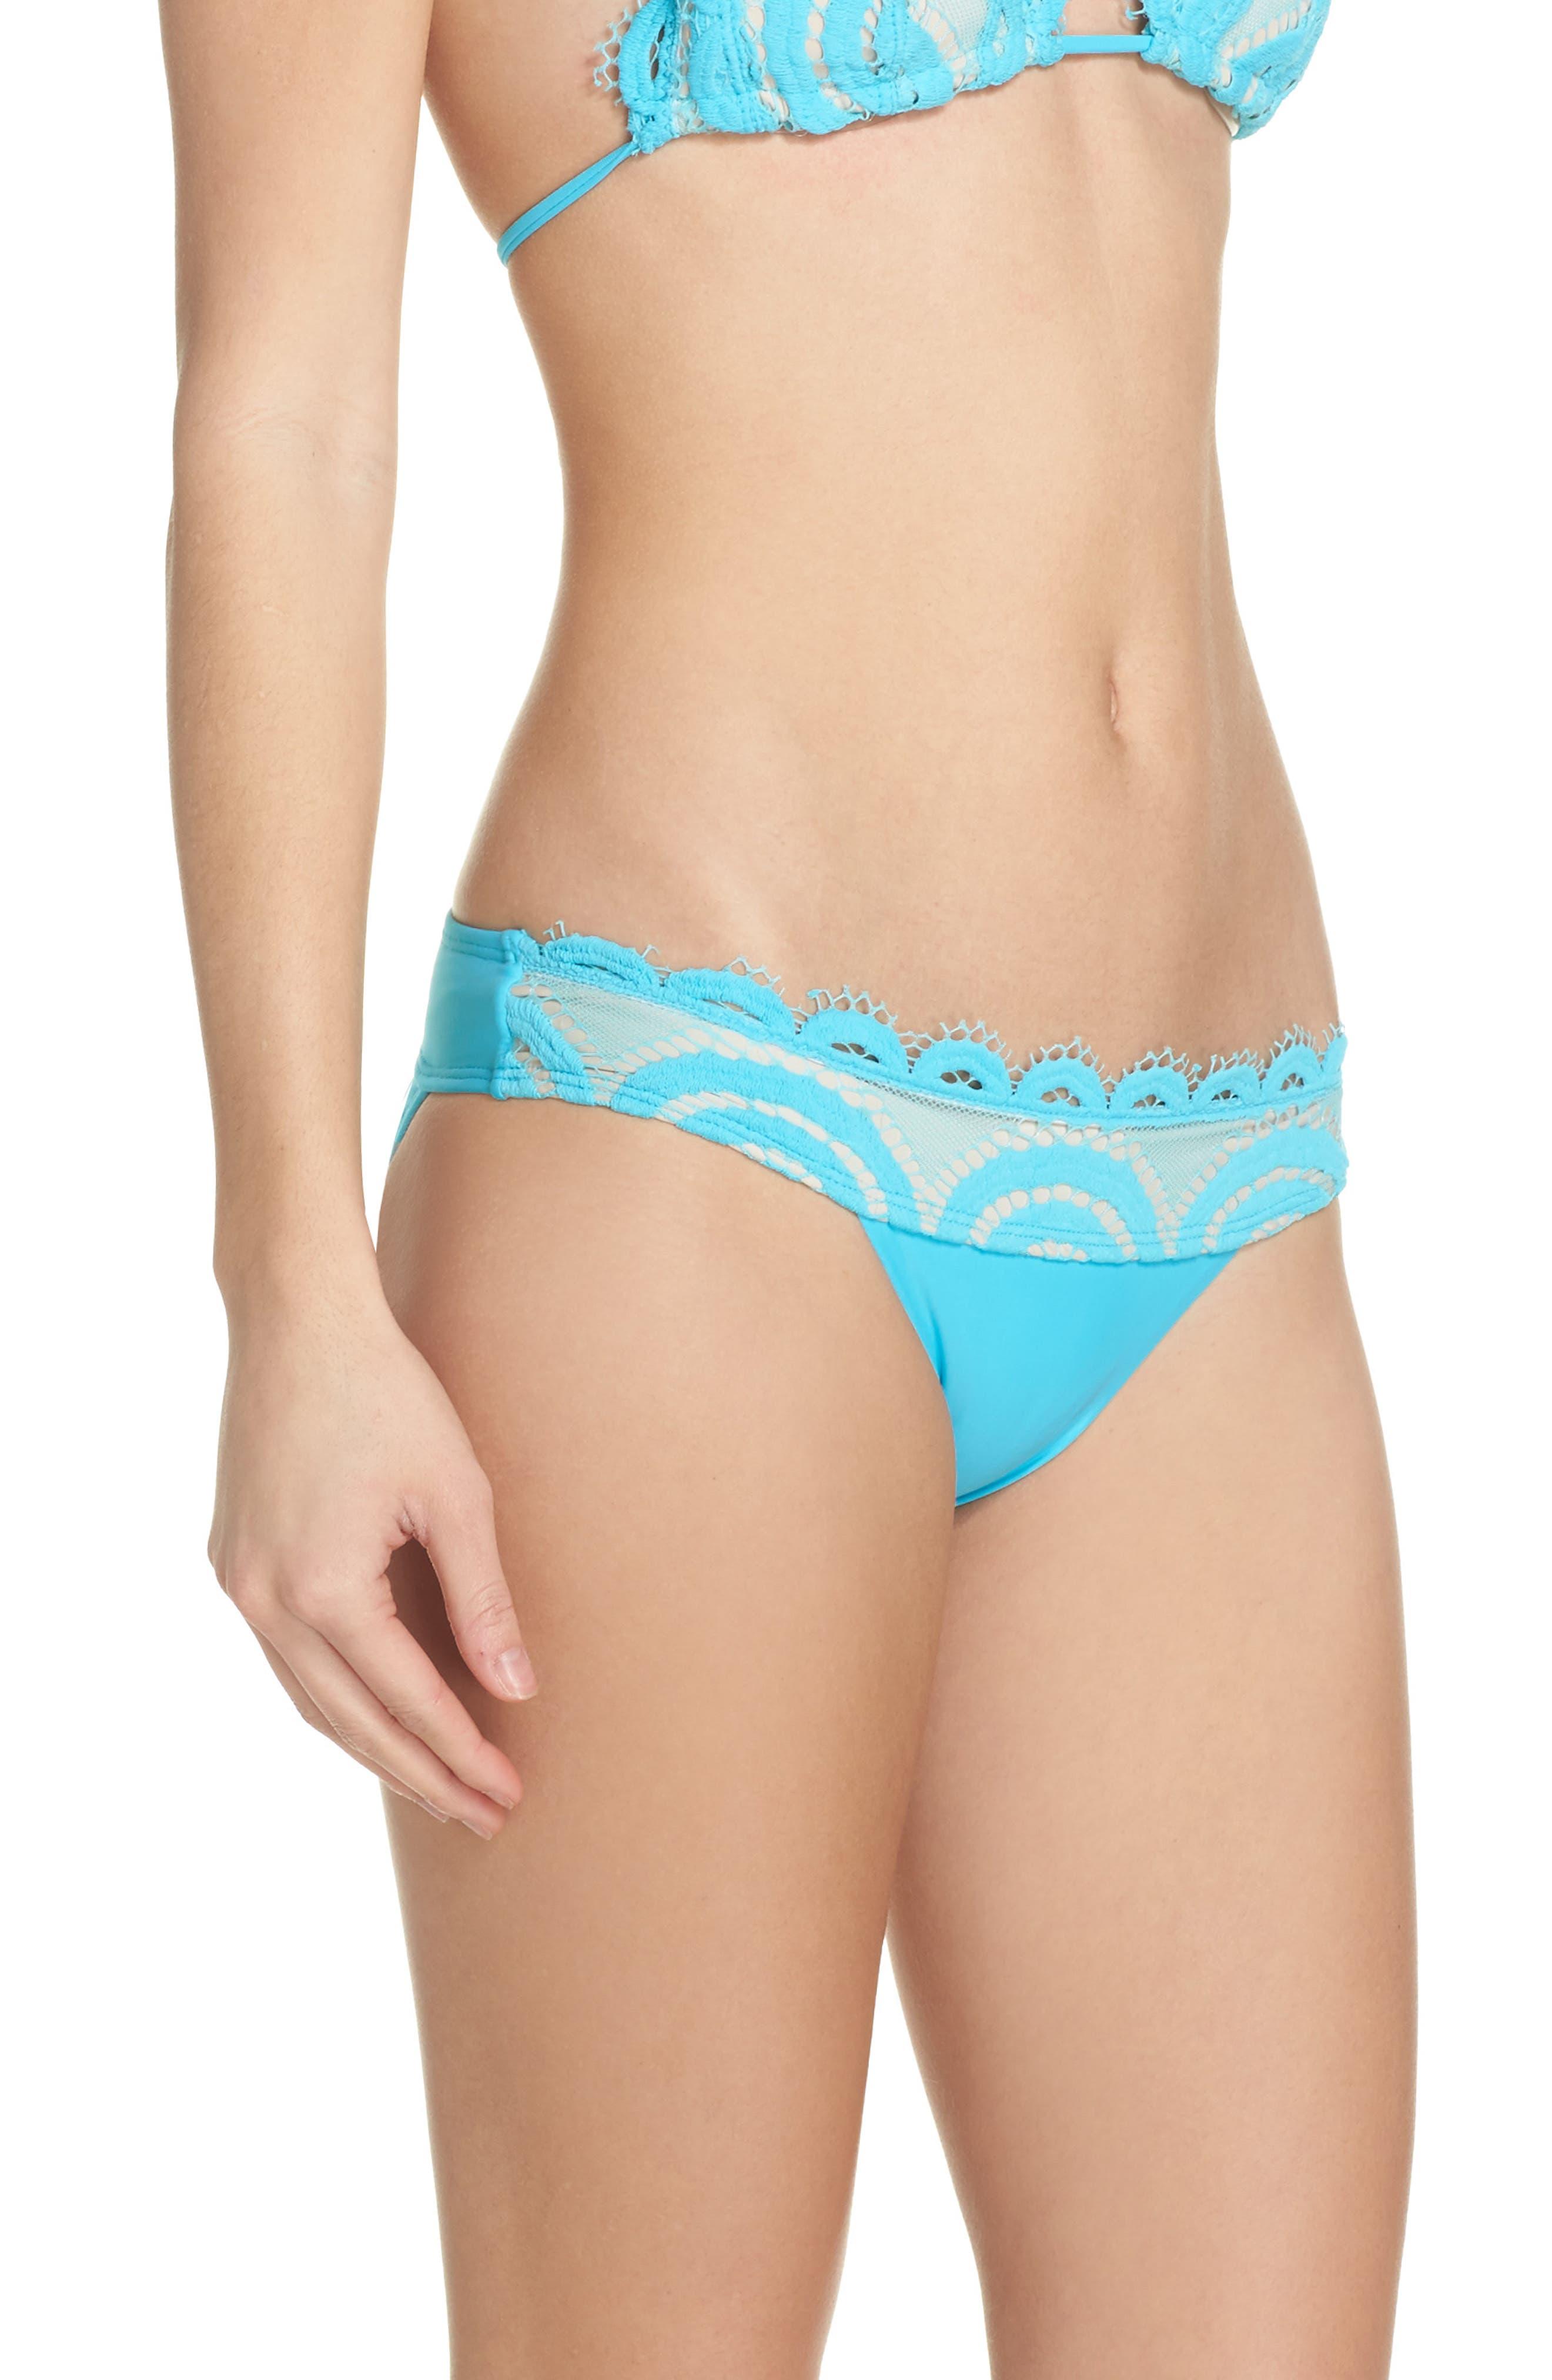 Banded Lace Bikini Bottoms,                             Alternate thumbnail 3, color,                             Marine